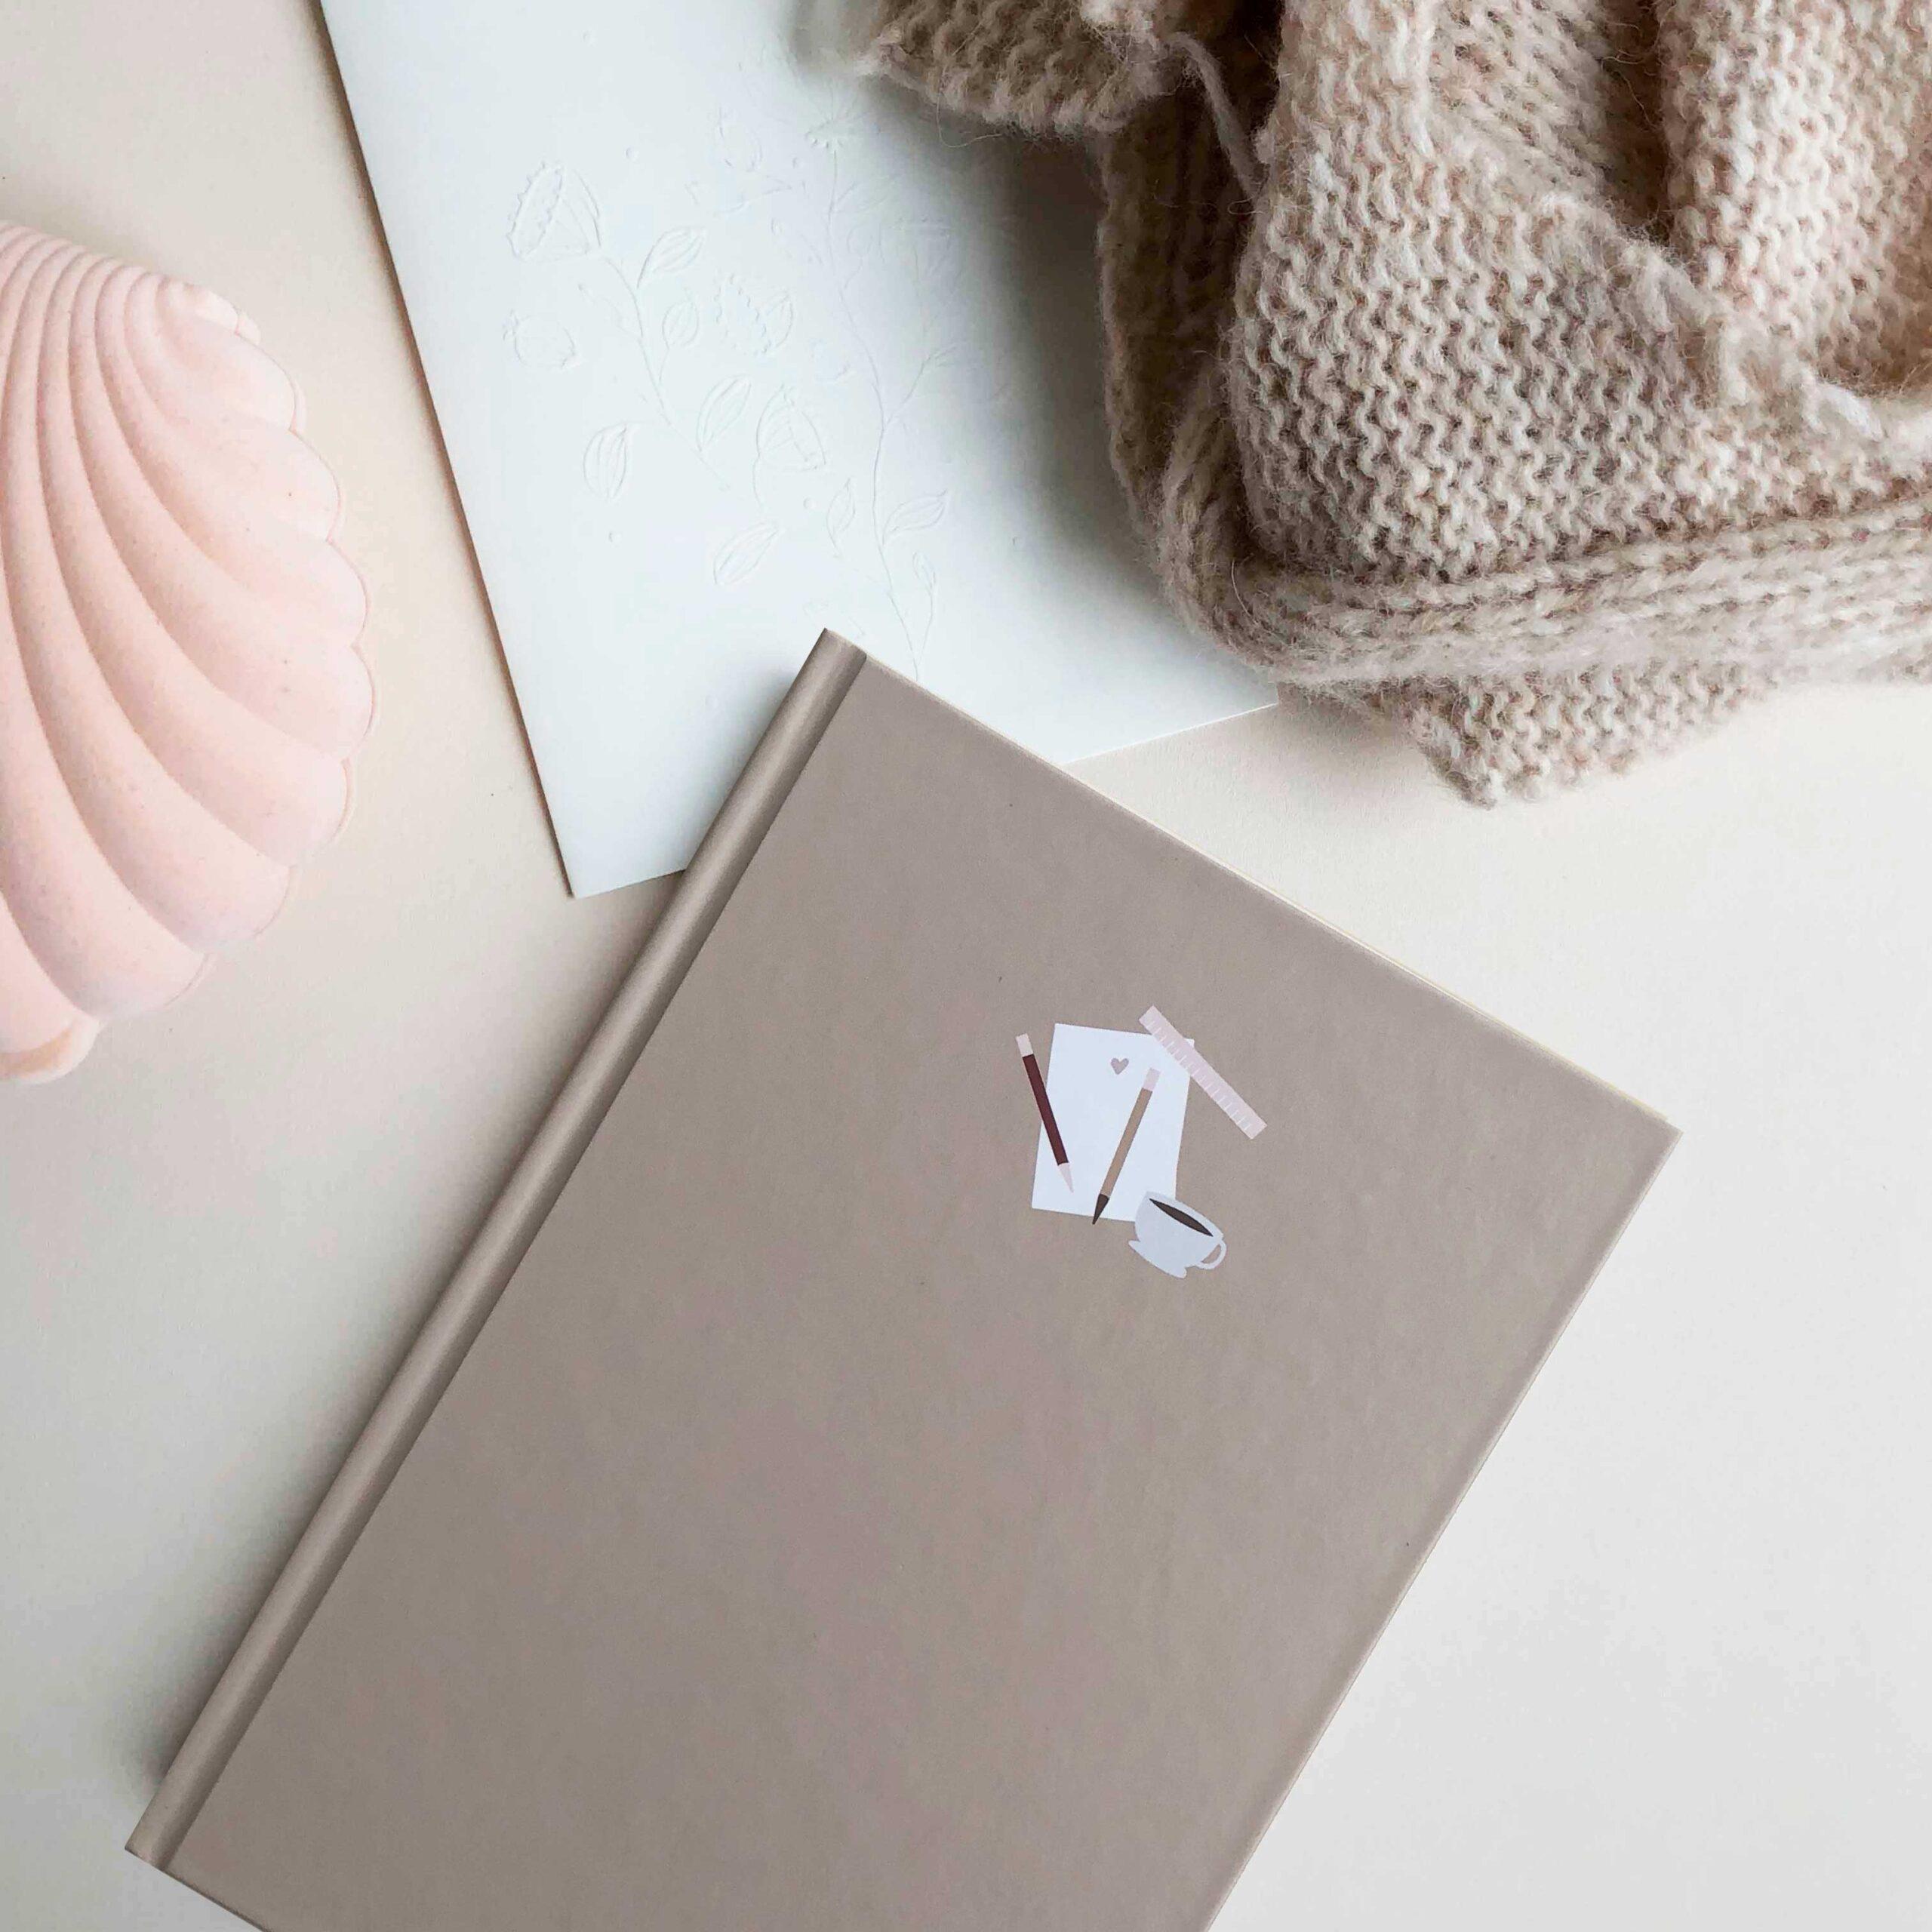 Notesbog - dotted journal